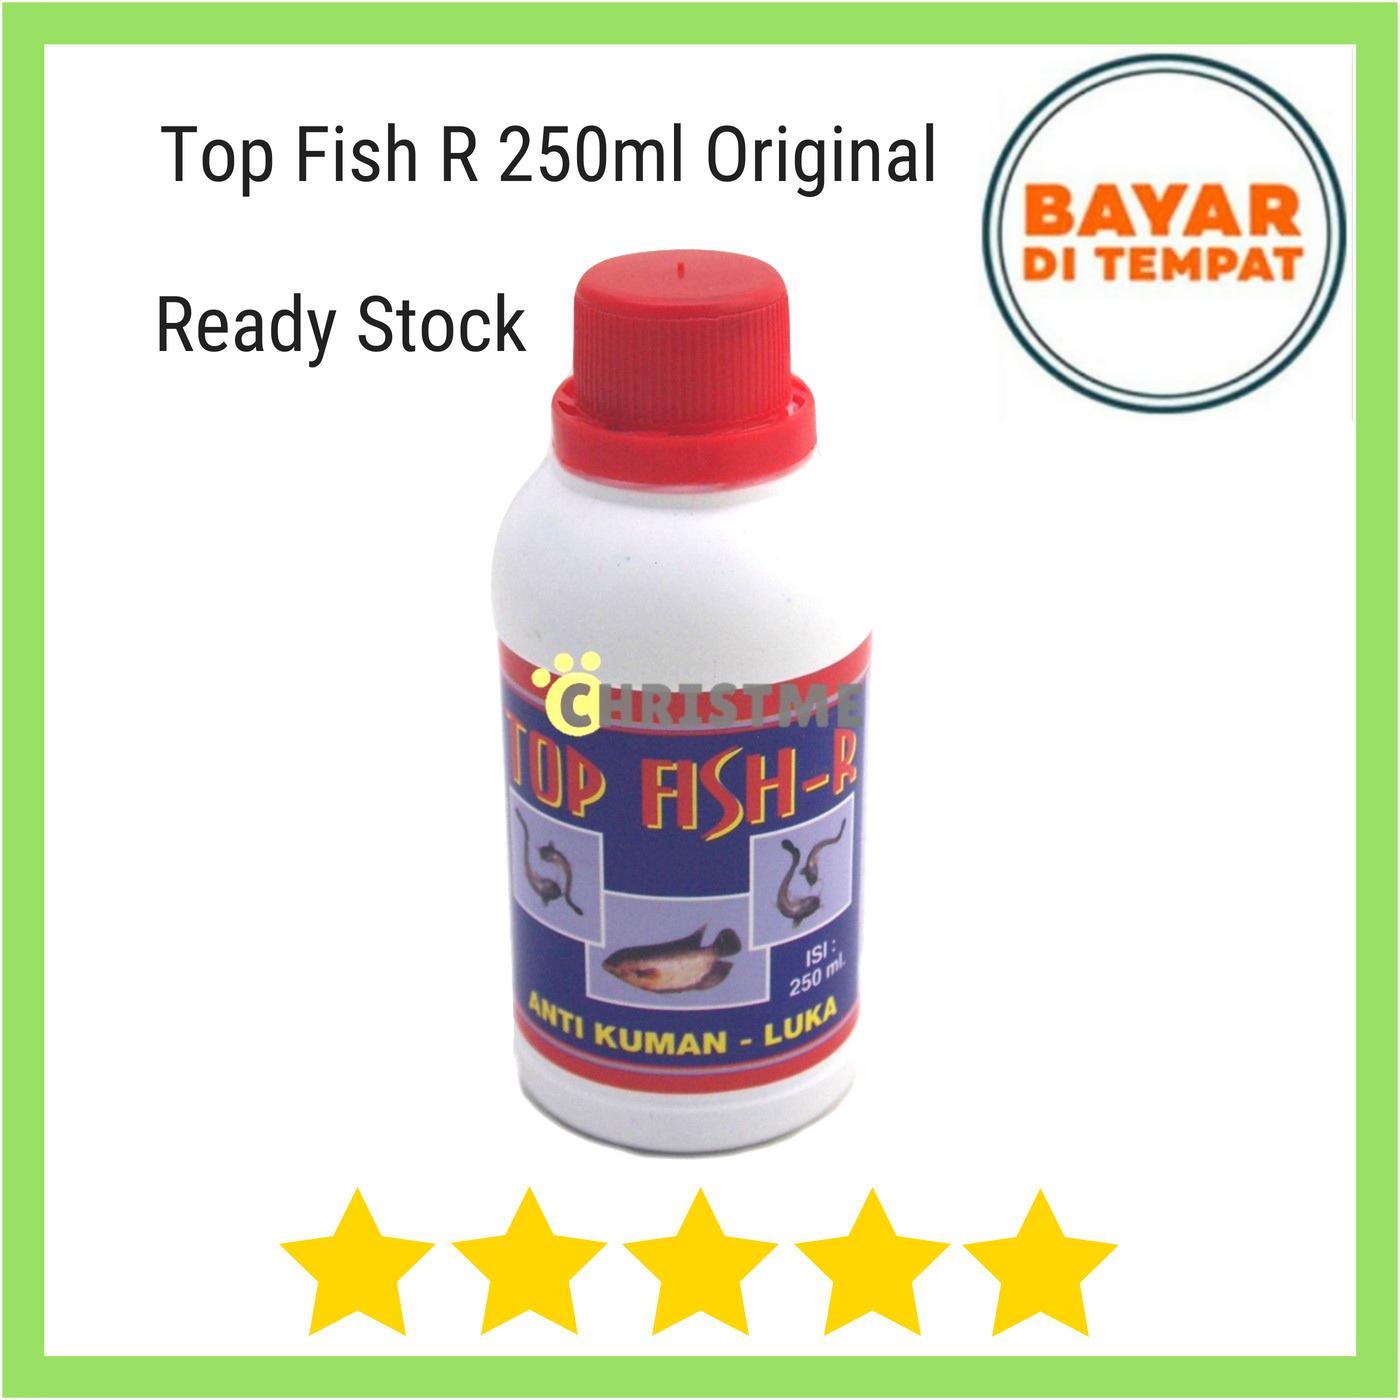 Top Fish Red 250Ml - Obat Anti Bakteri Kuman Luka Pada Ikan Mas Gurami Lele Udang Nila Patin Mujahir Bandeng Belut dll